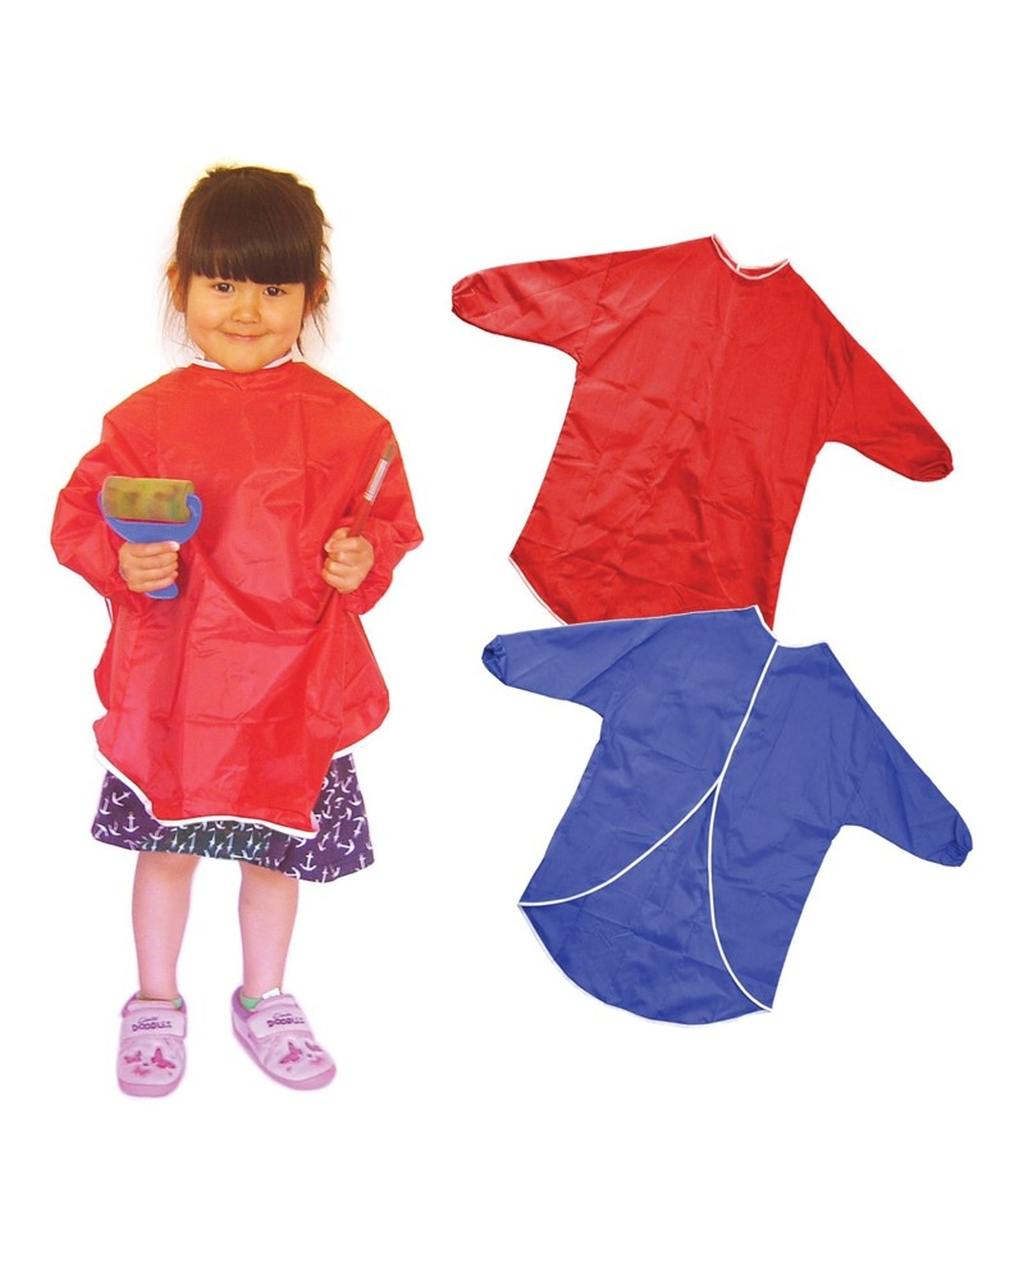 Children's Play Apron 80cm Red